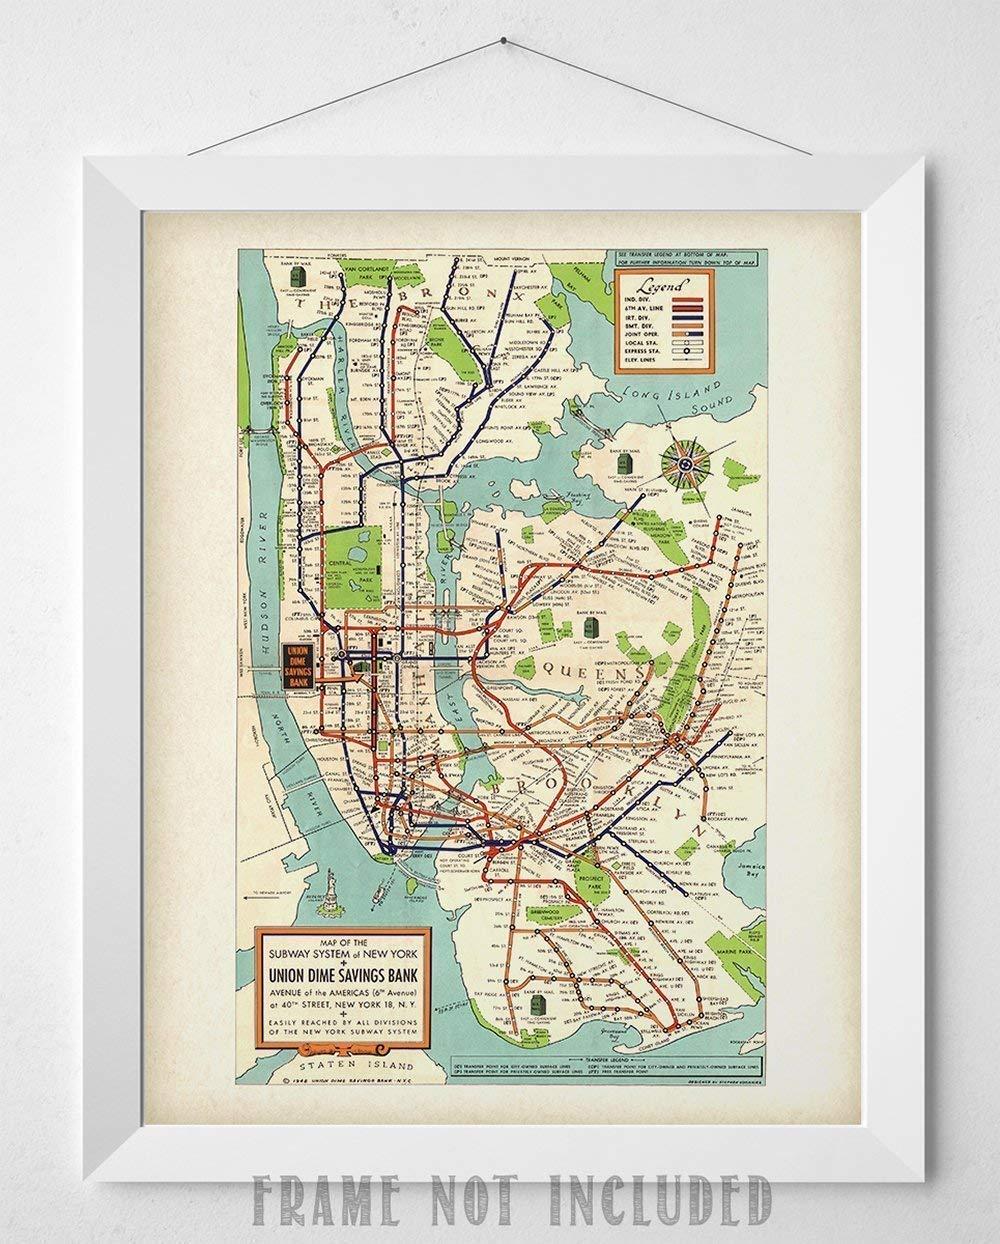 New York Subway Map Art.Amazon Com New York Subway Map 1948 11x14 Unframed Art Print